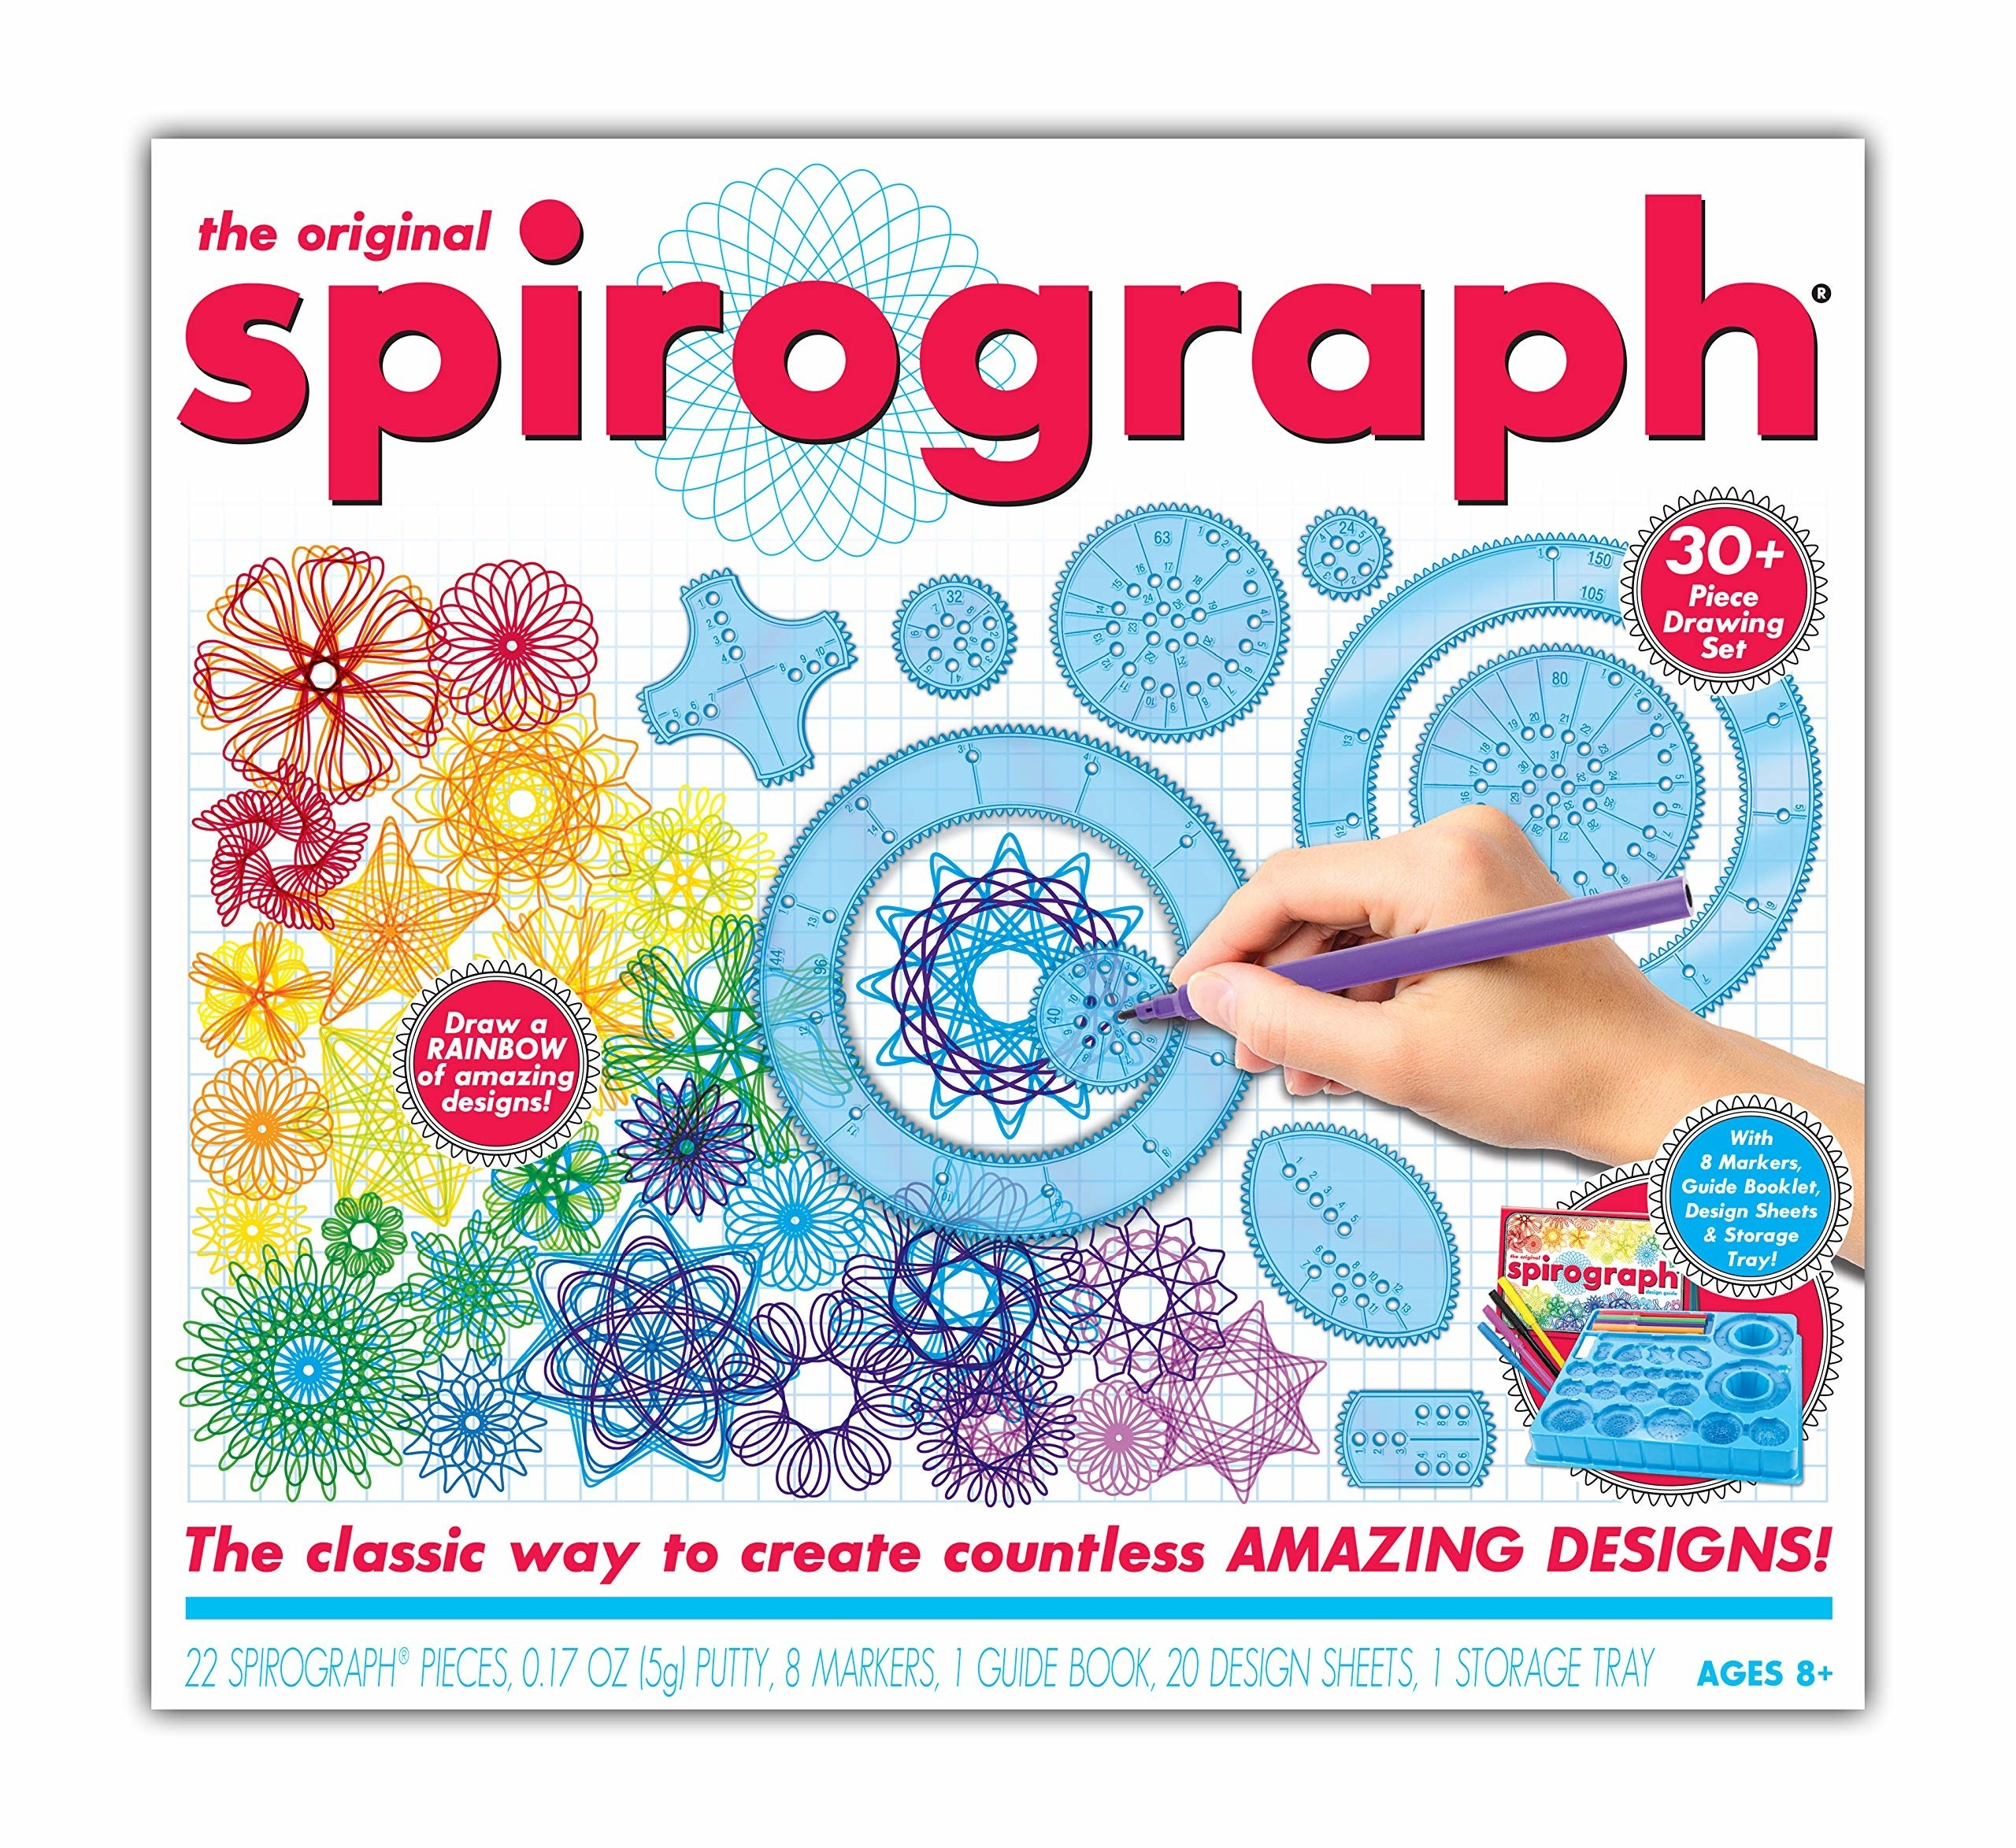 The spirograph kit